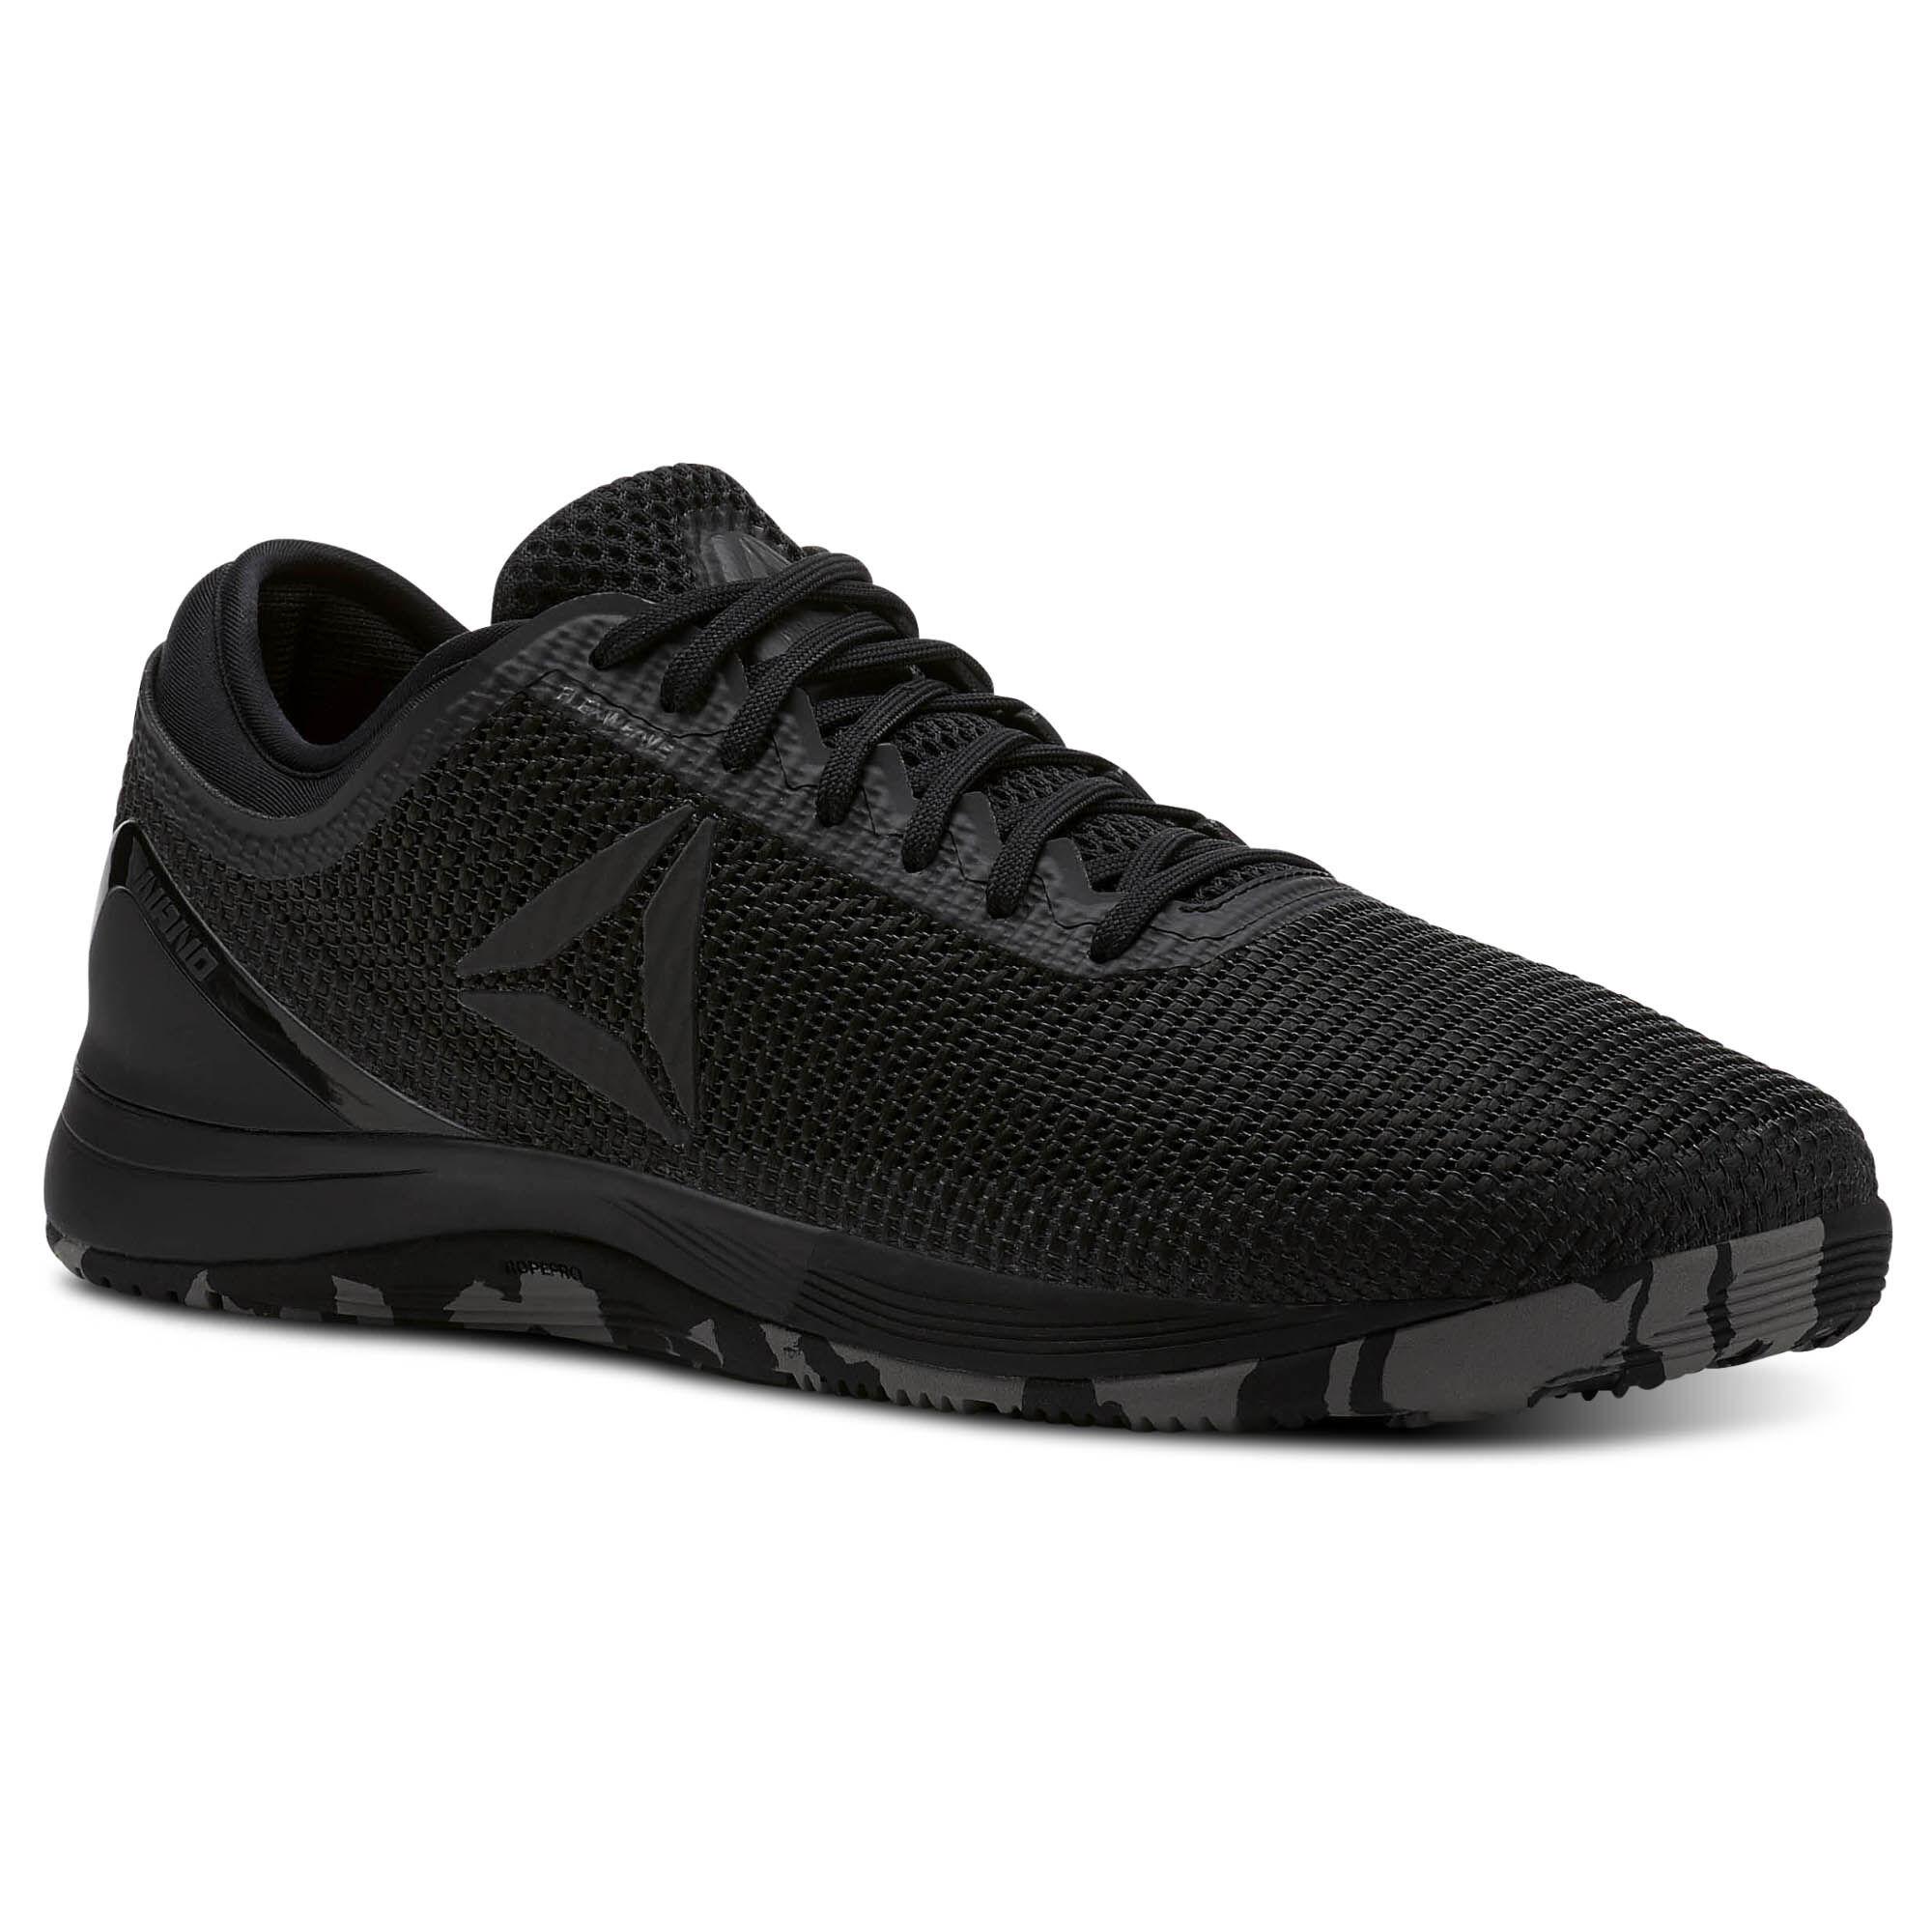 Reebok CXT TR - Sports shoes - red/black/grey/white WiJ0Pv5Zu